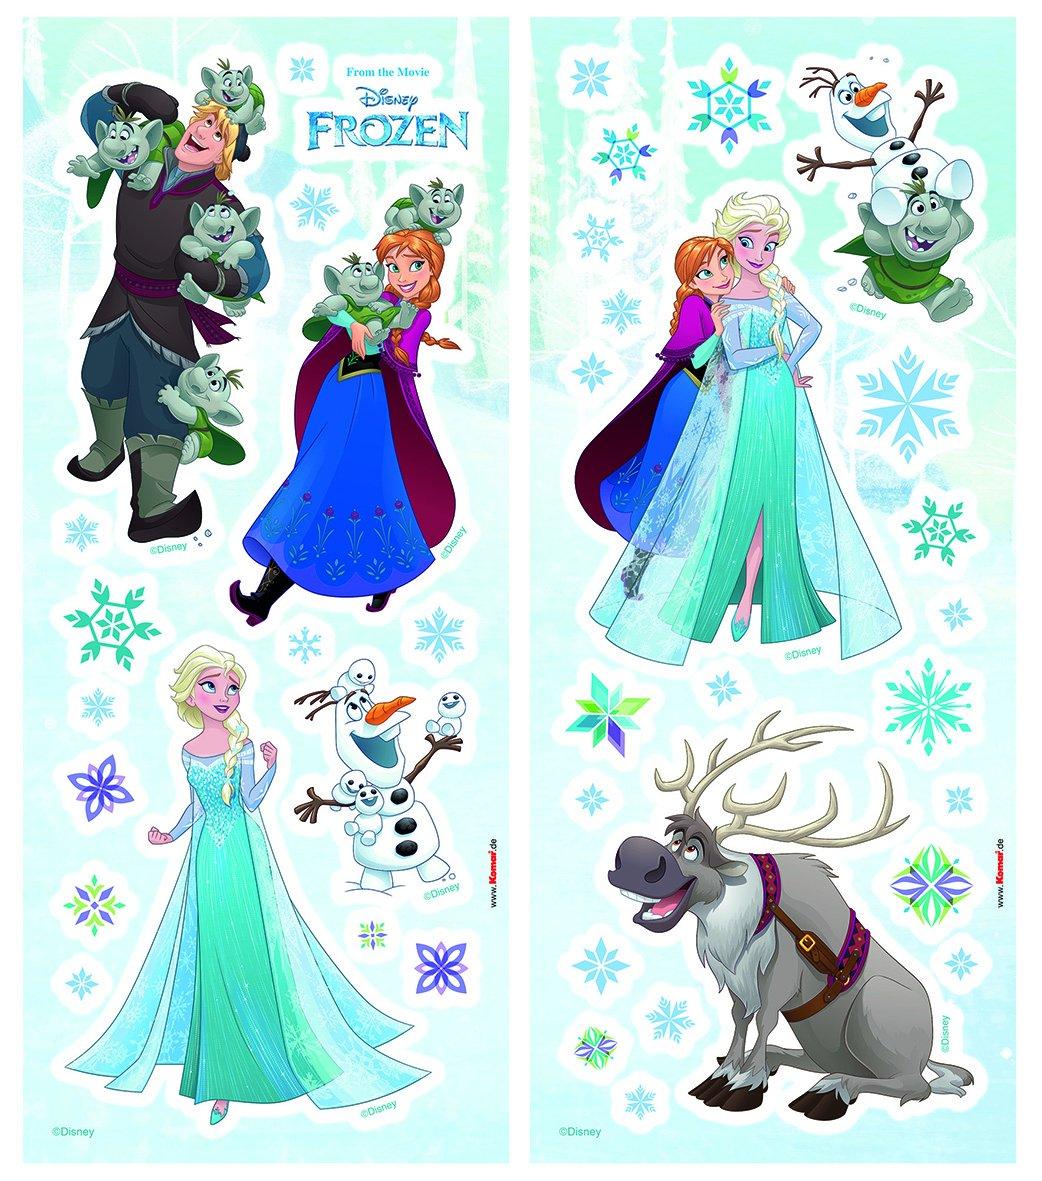 Komar 14046h Anna Deco-Sticker FROZEN SISTERS 50 x 70 cm Wandtattoo Disney Wandsticker Eisk/önigin Elsa Wandbild Wandaufkleber Olaf